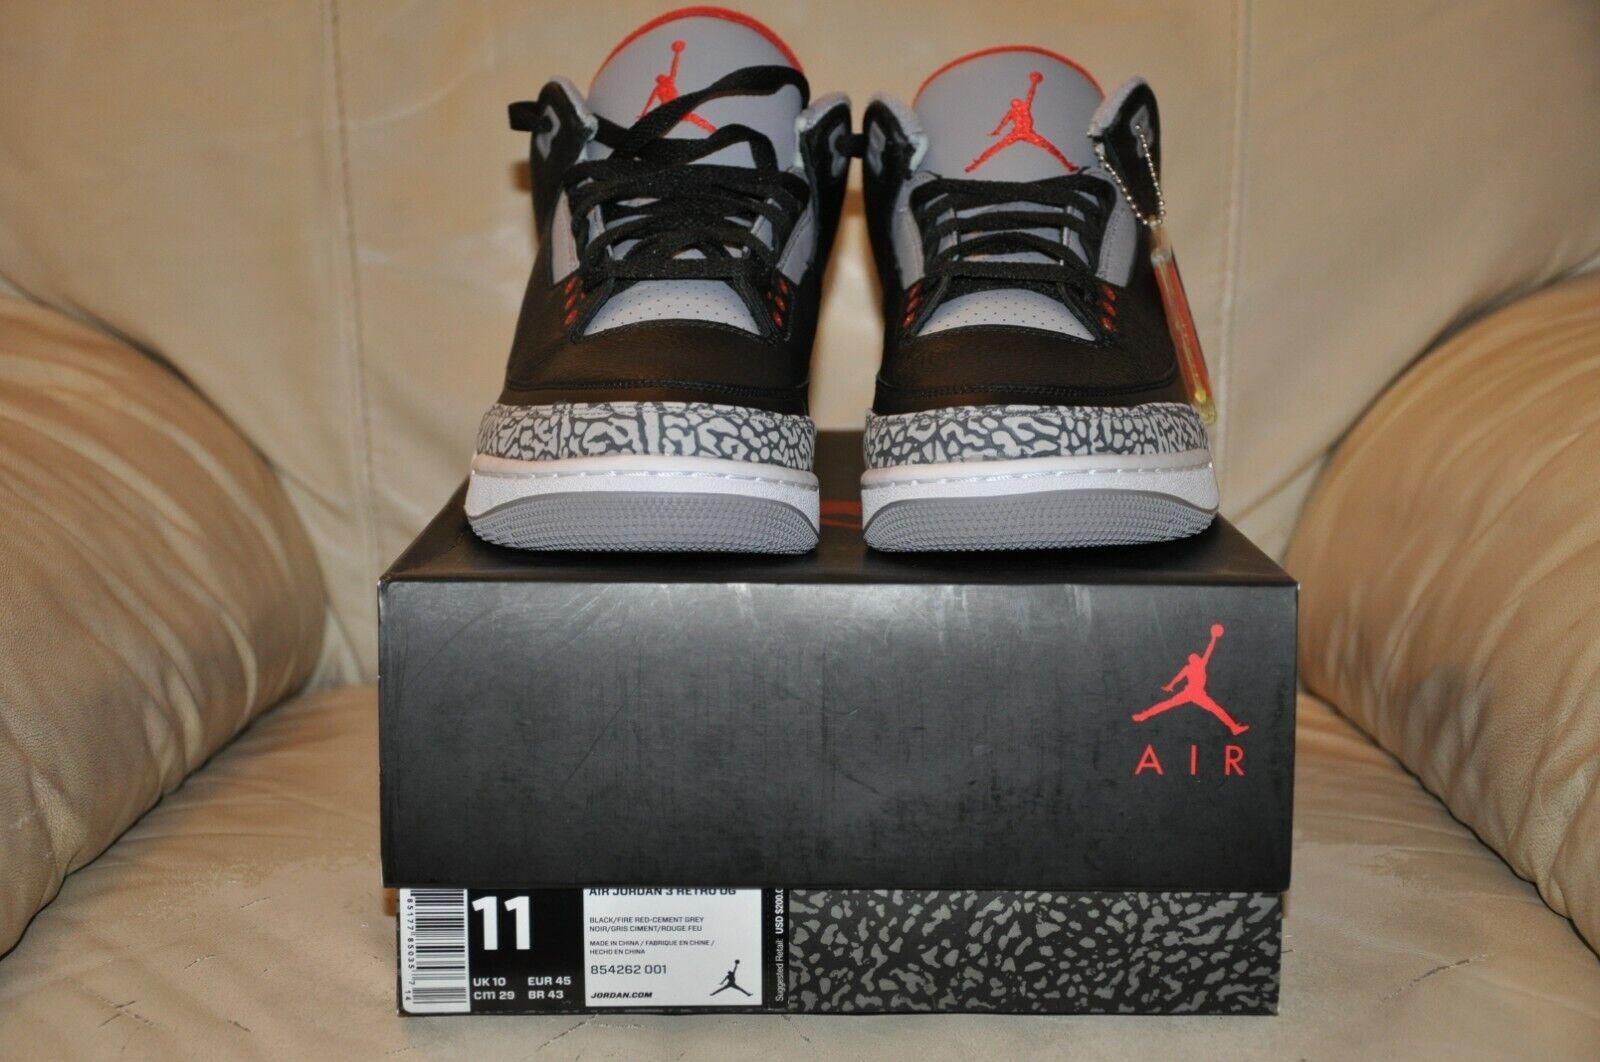 outlet store a876b 03d0e Nike Air Jordan 3 Retro Black Cement BC Size 11